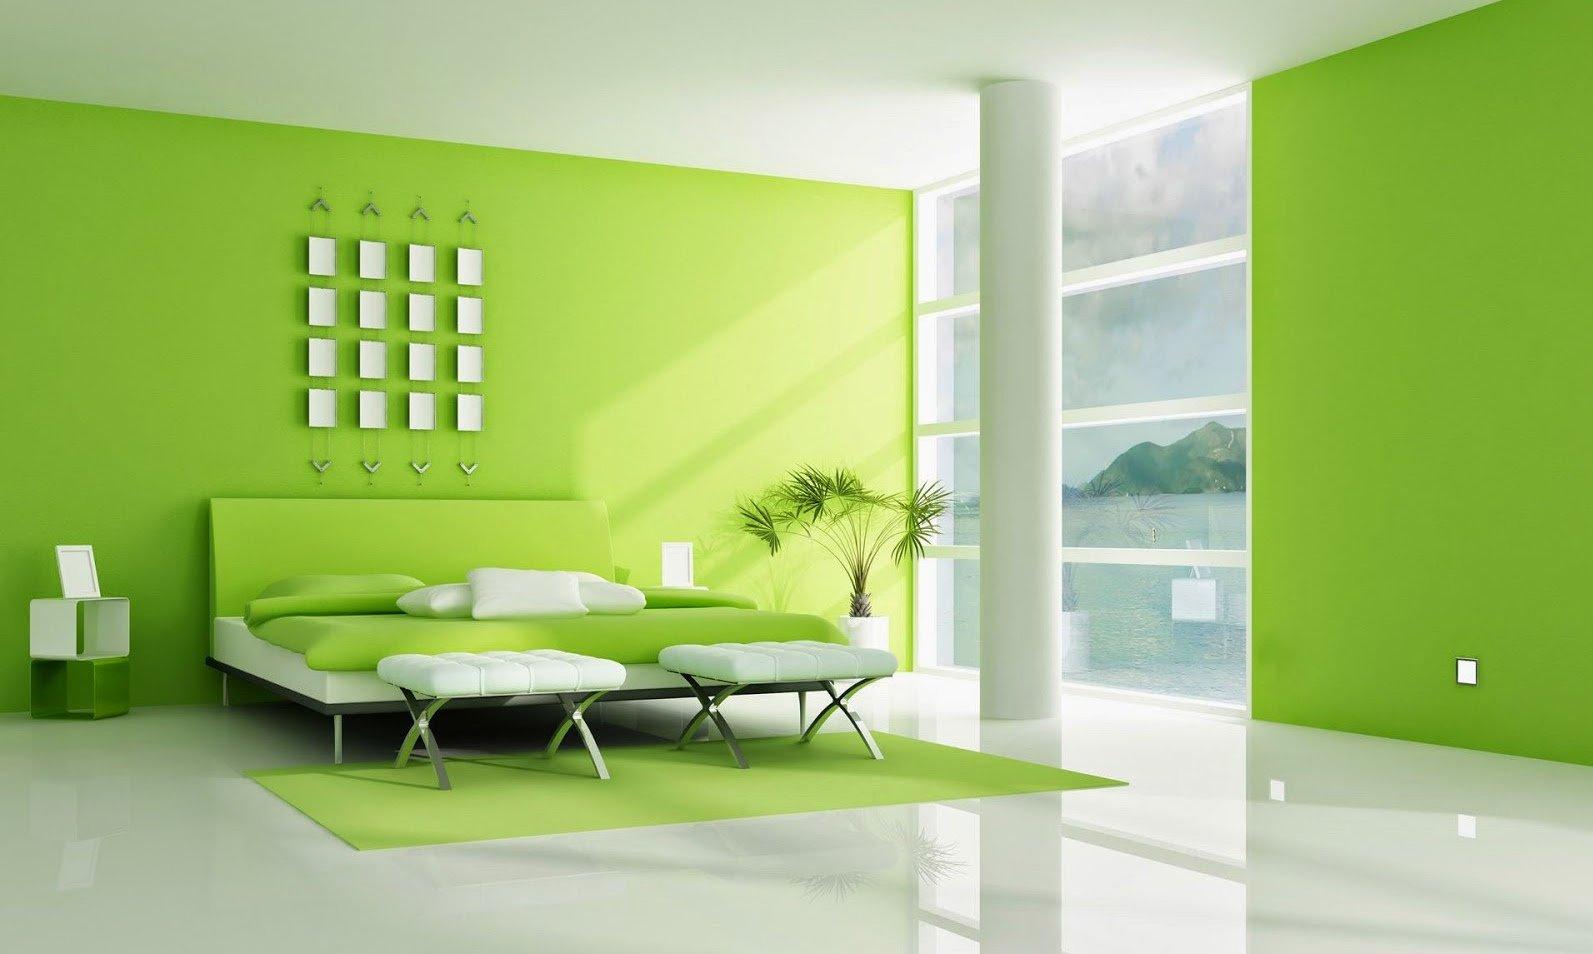 interior-rumah-minimalis-cat-warna-hijau-4-1475737790